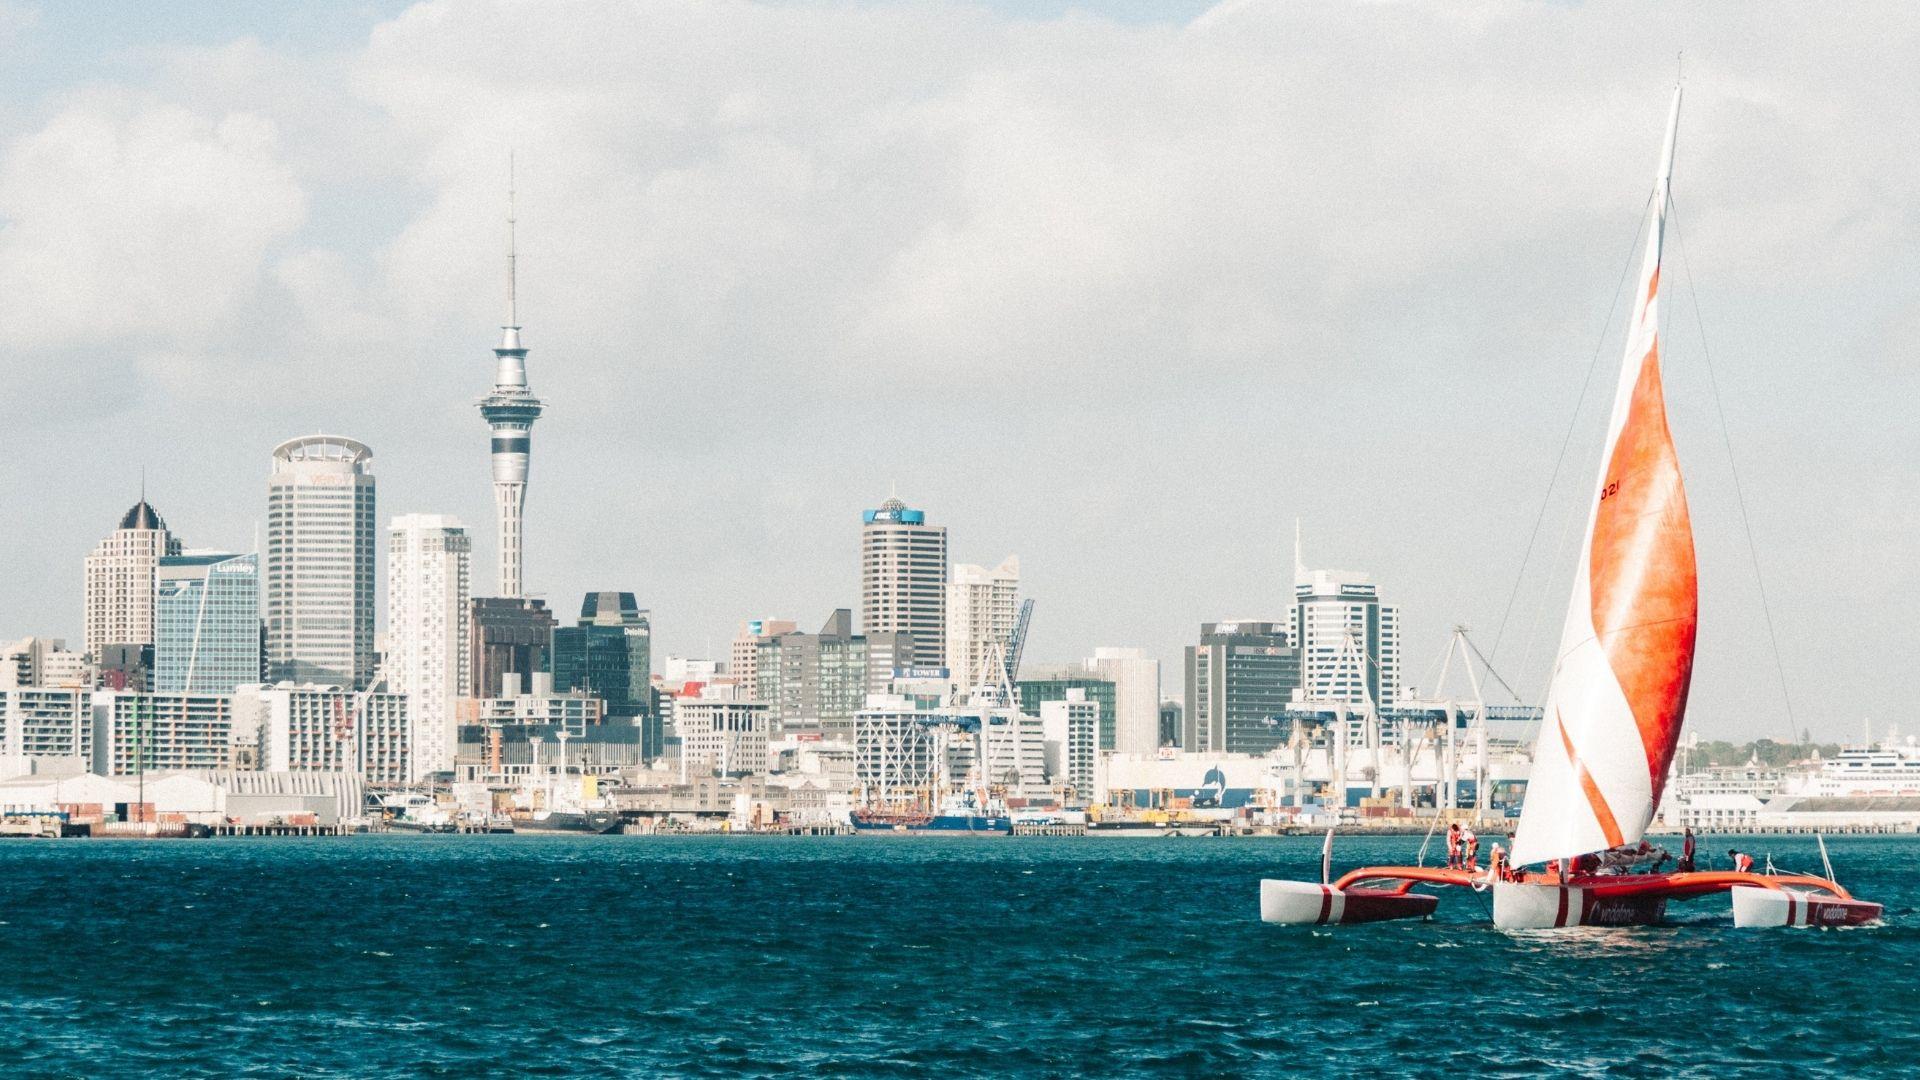 Auckland level 3 lockdown